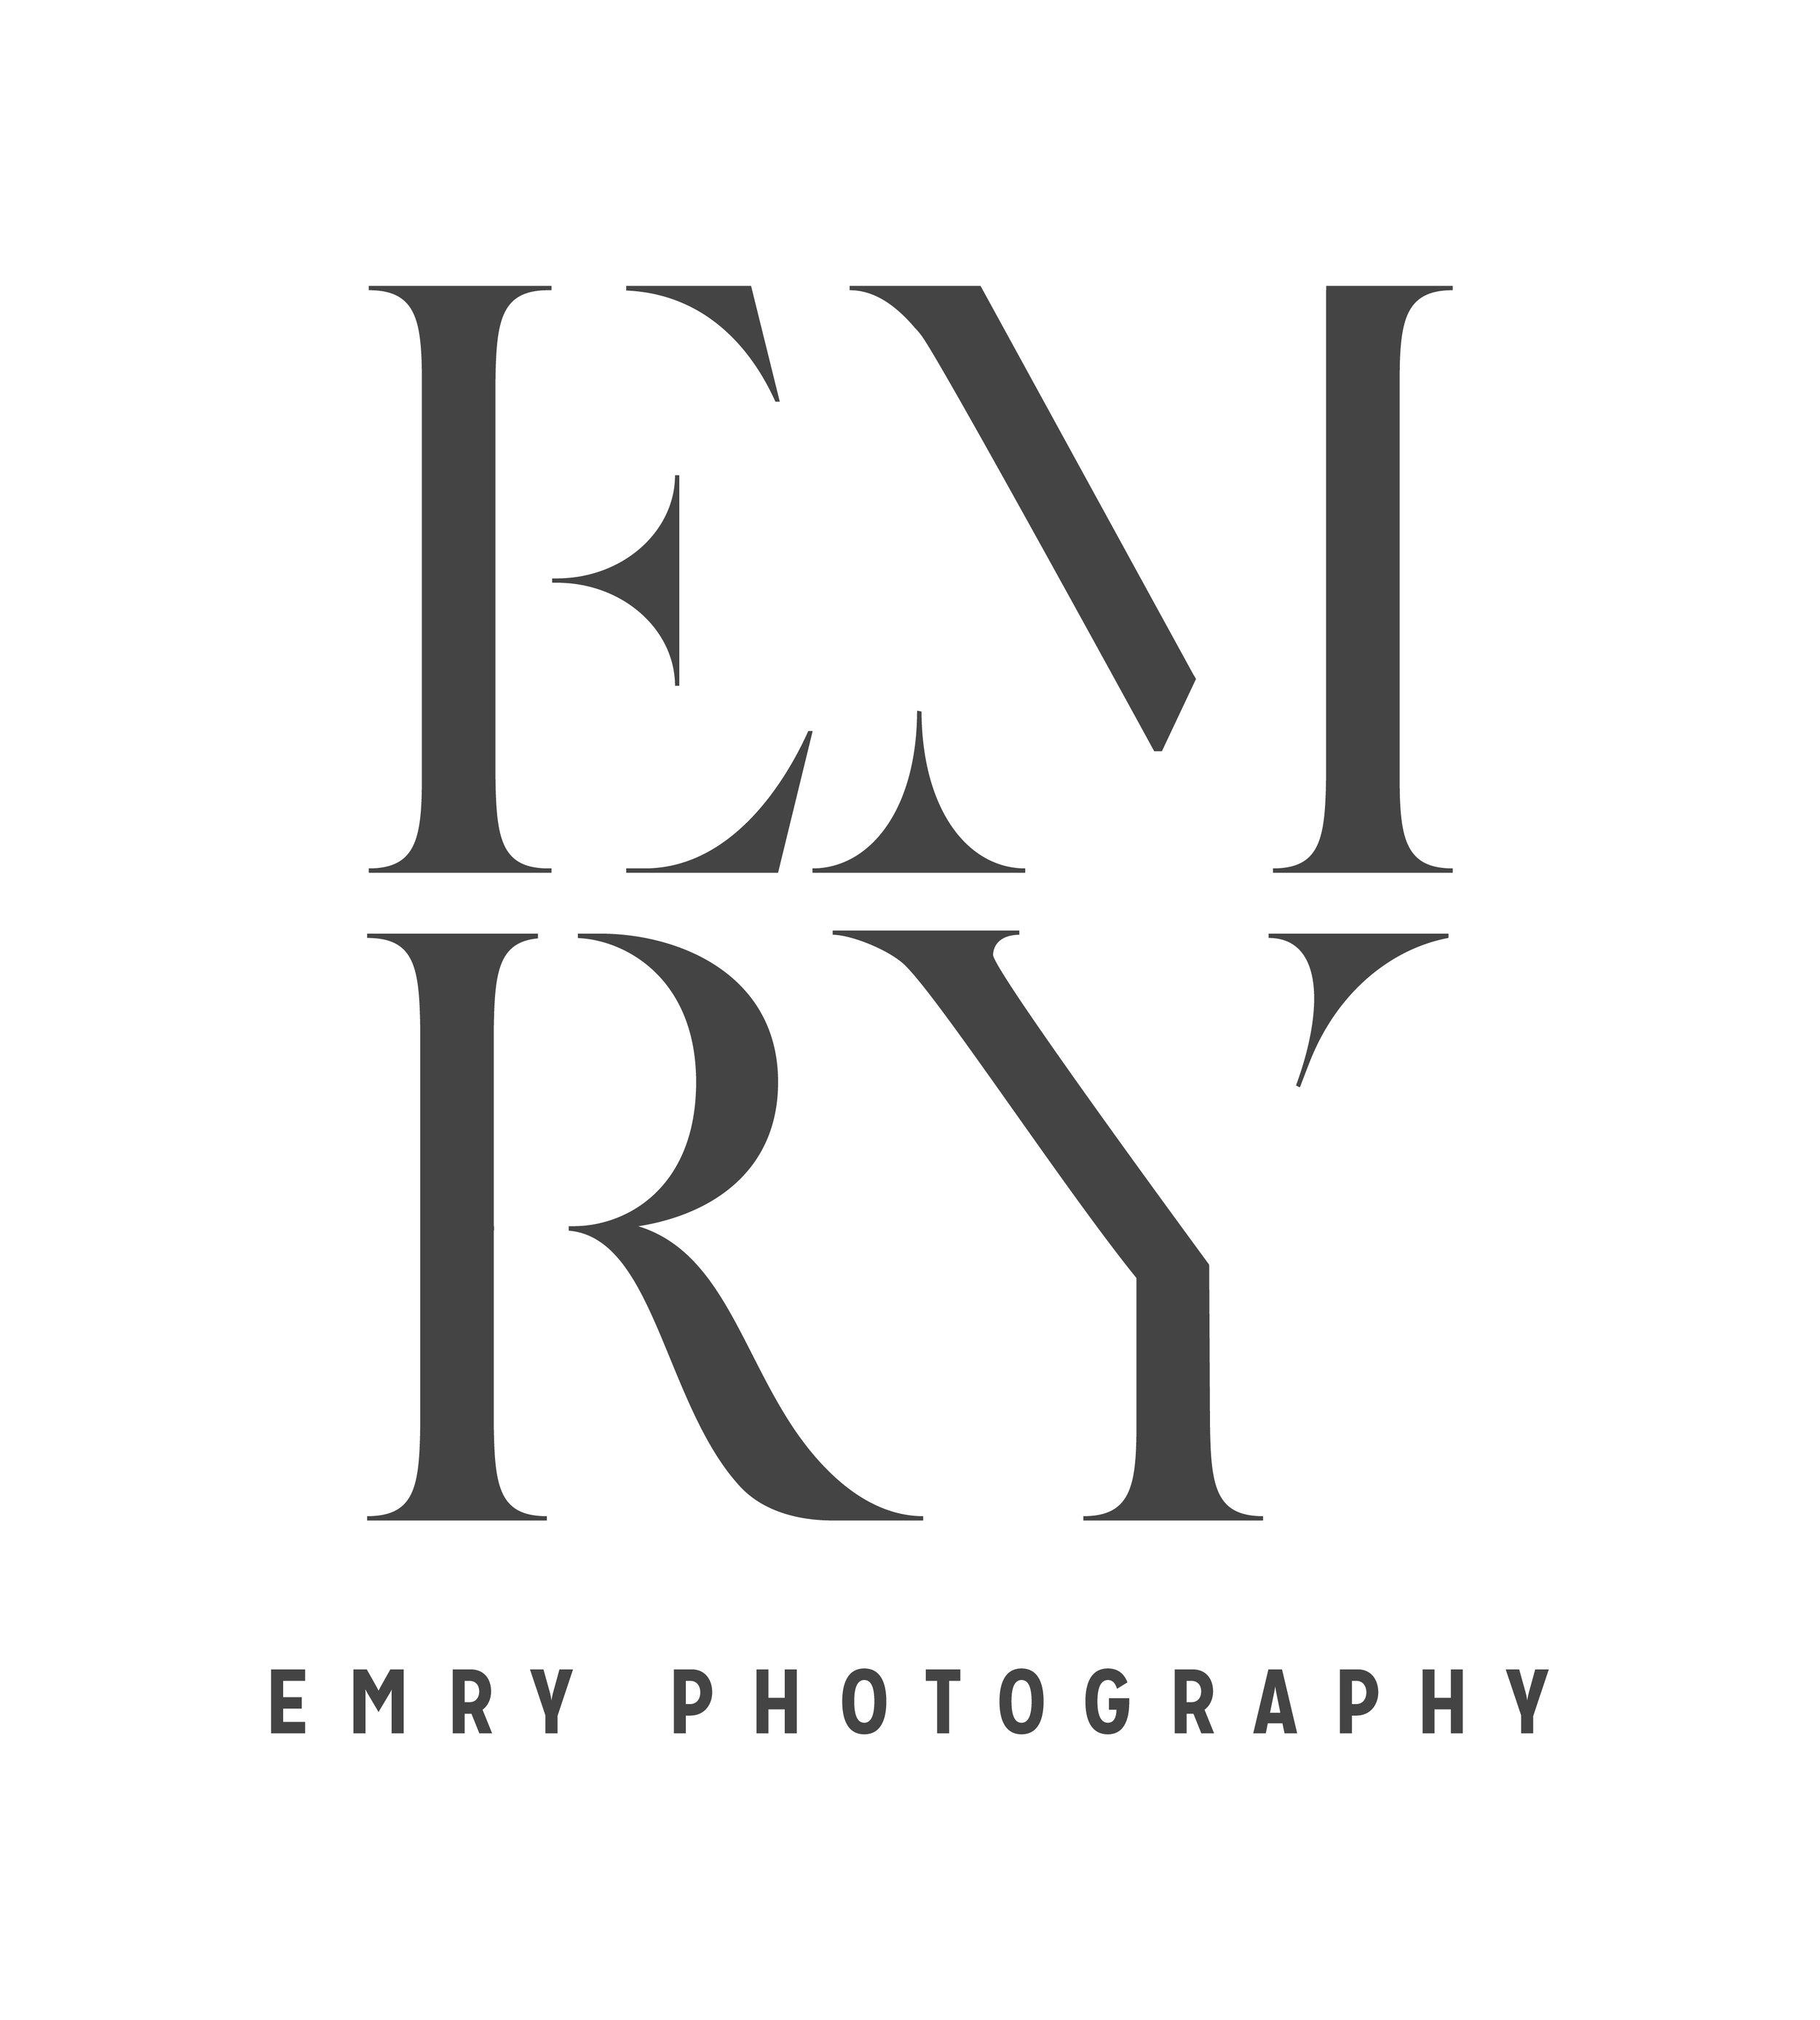 Emry Photography Logo Margins.jpg